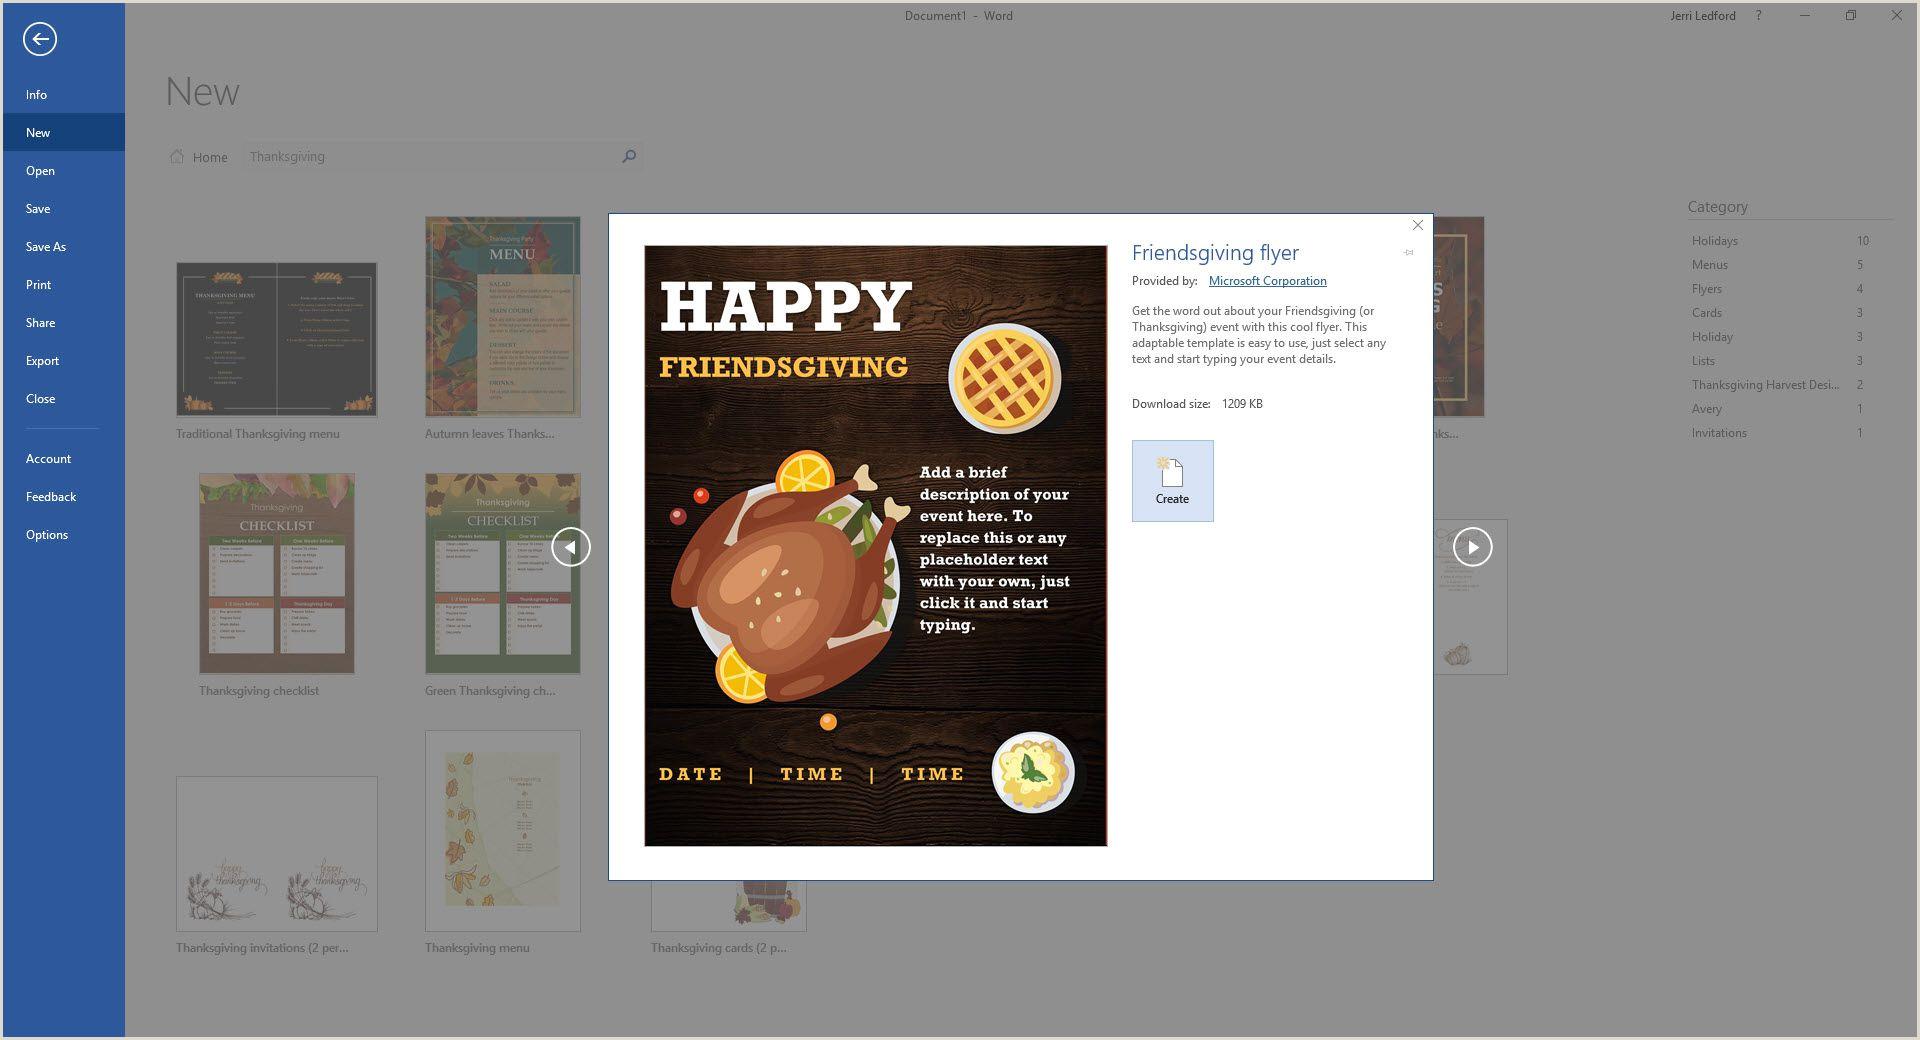 Salon Menu Templates Microsoft Word Best Free Thanksgiving Templates for Microsoft Word